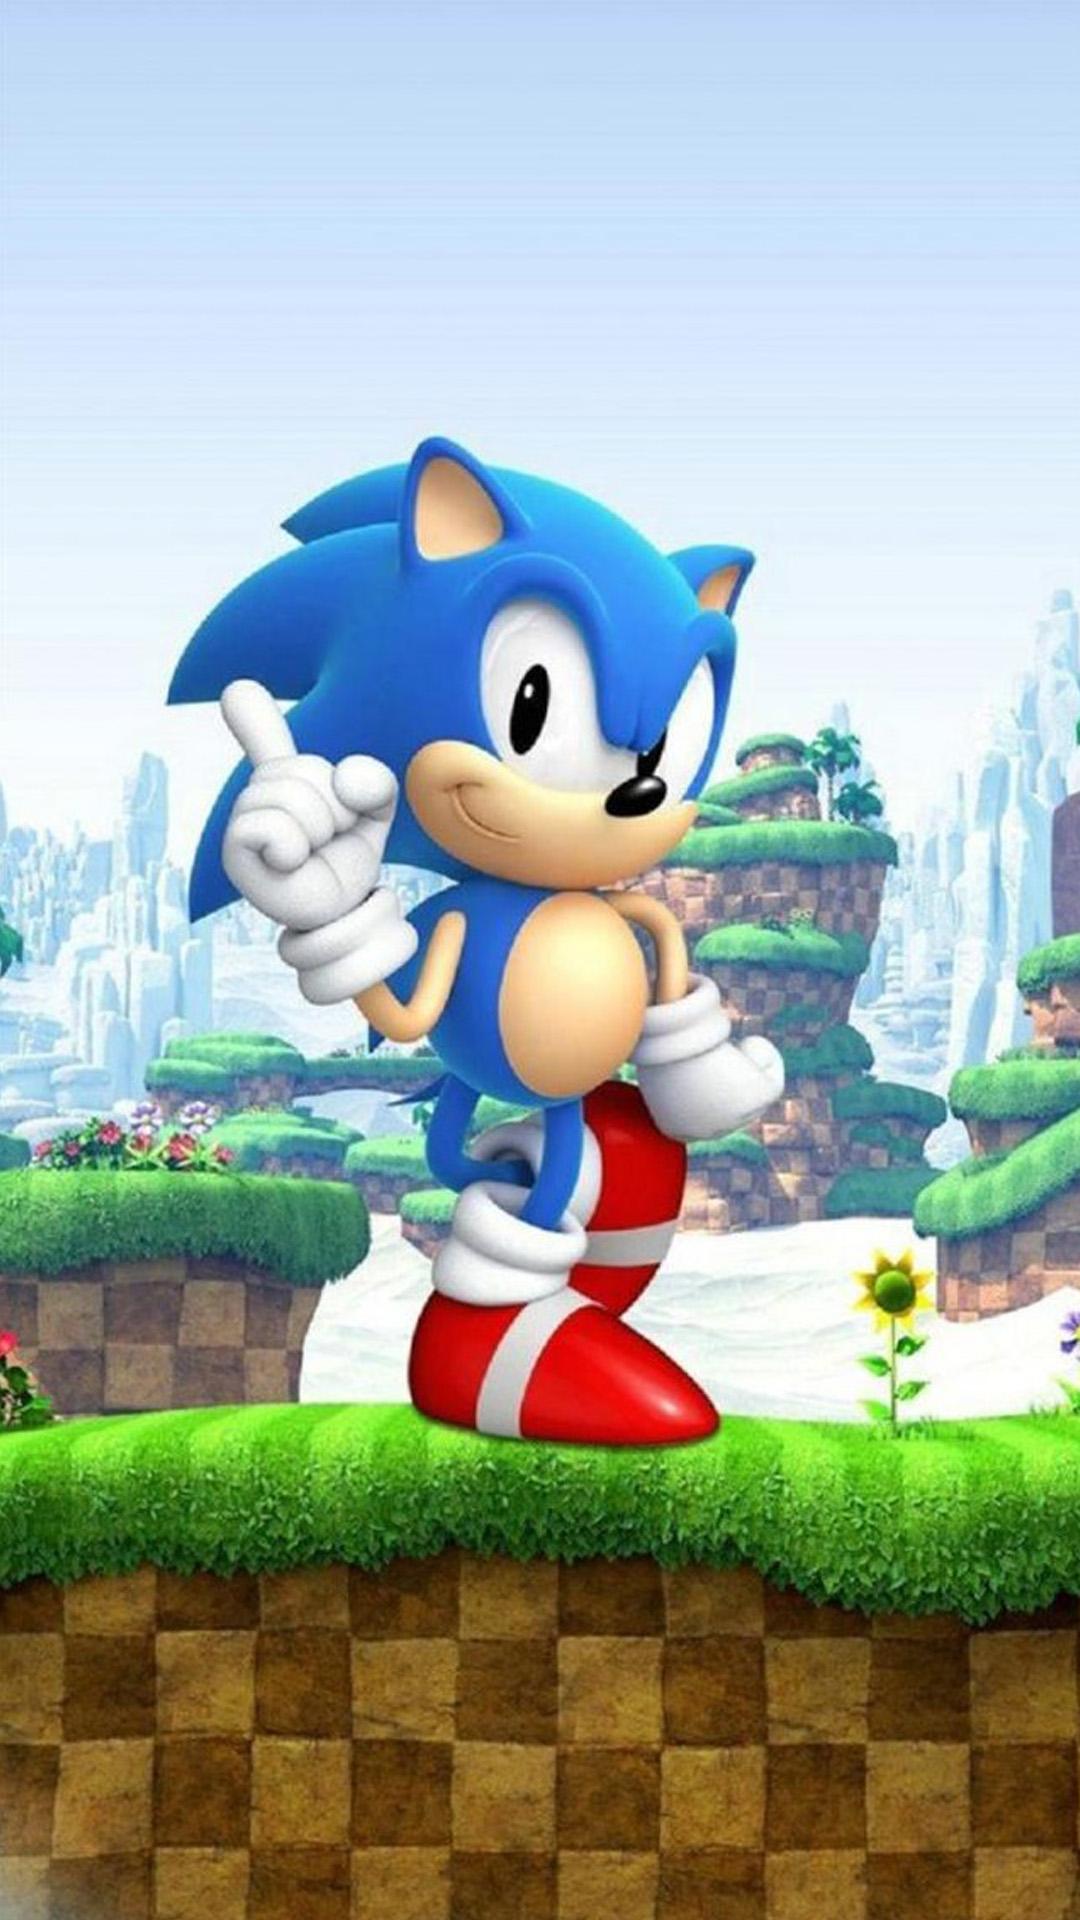 Sonic The Hedgehog Mobile Wallpaper